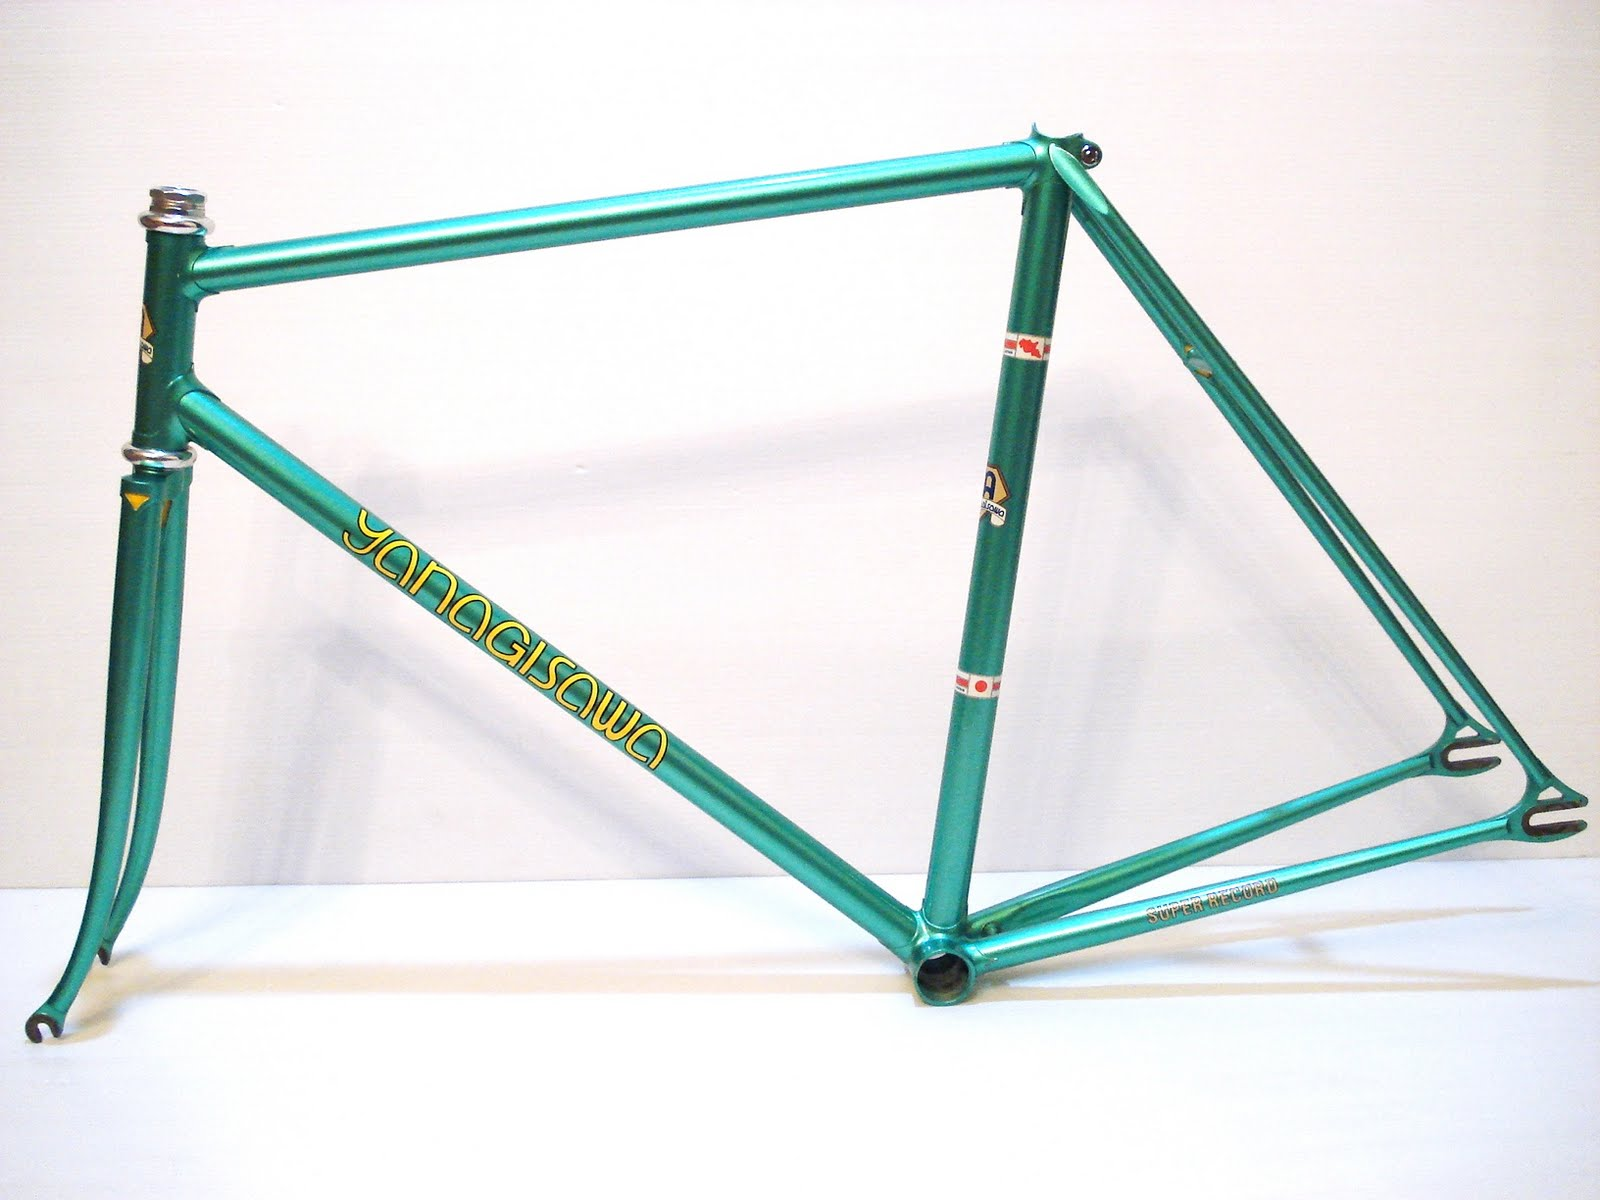 SUPER MAKURI: yanagisawa Emerald Green njs